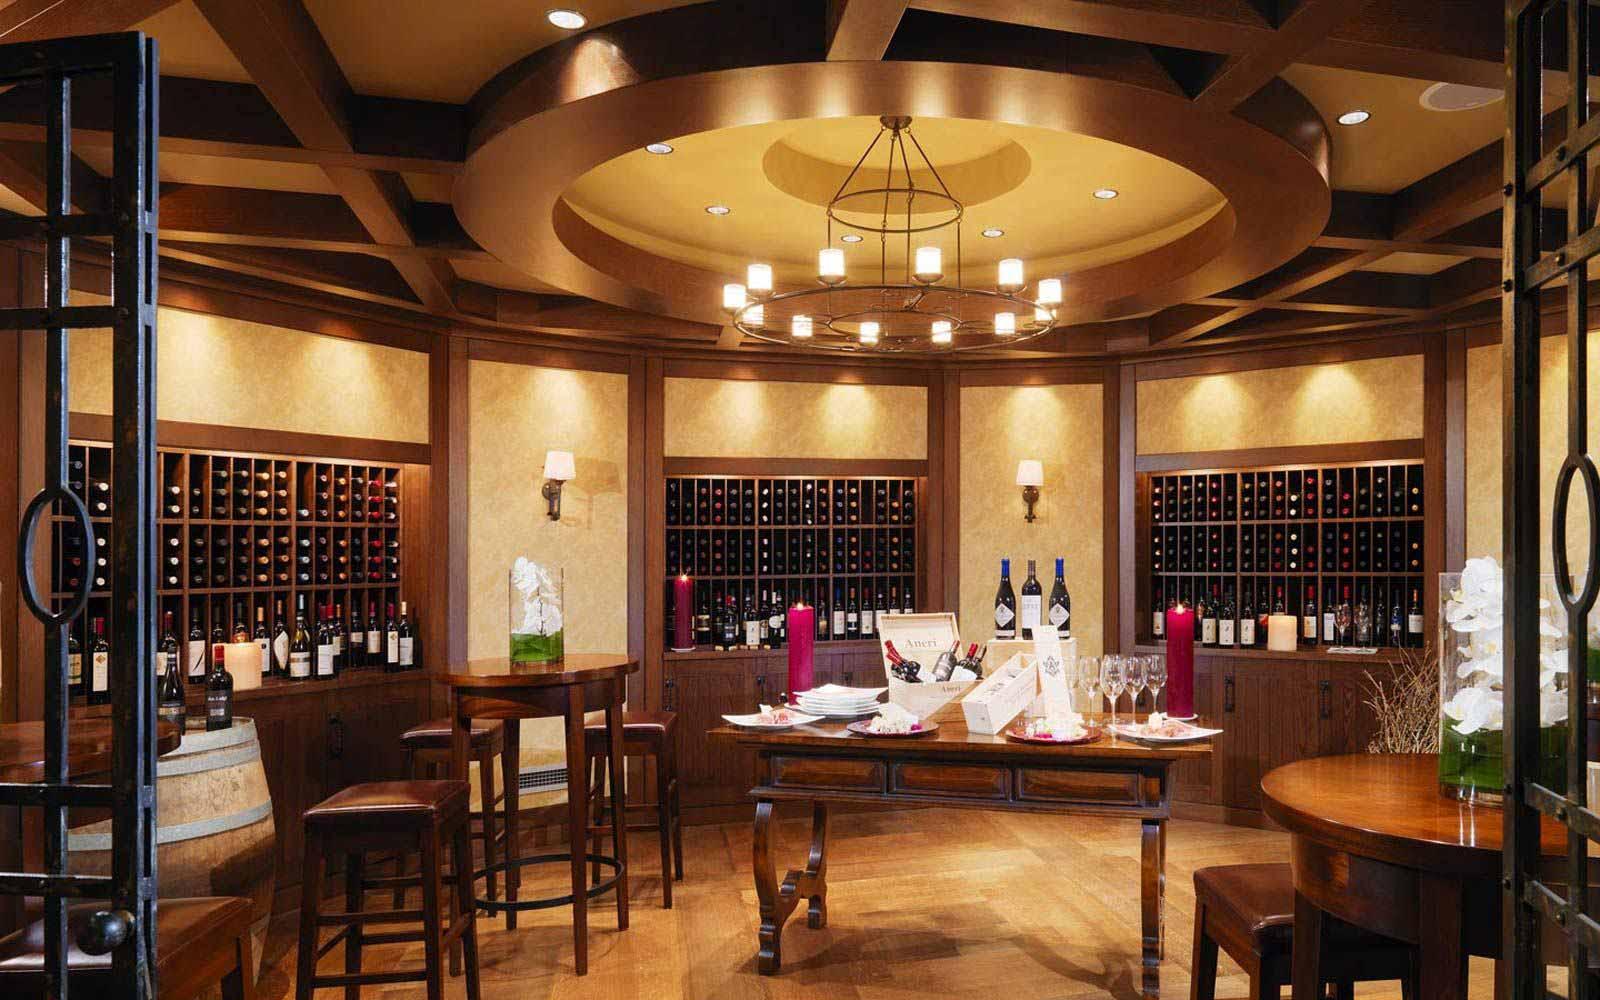 VinOrvm wine cellar at The Westin Excelsior